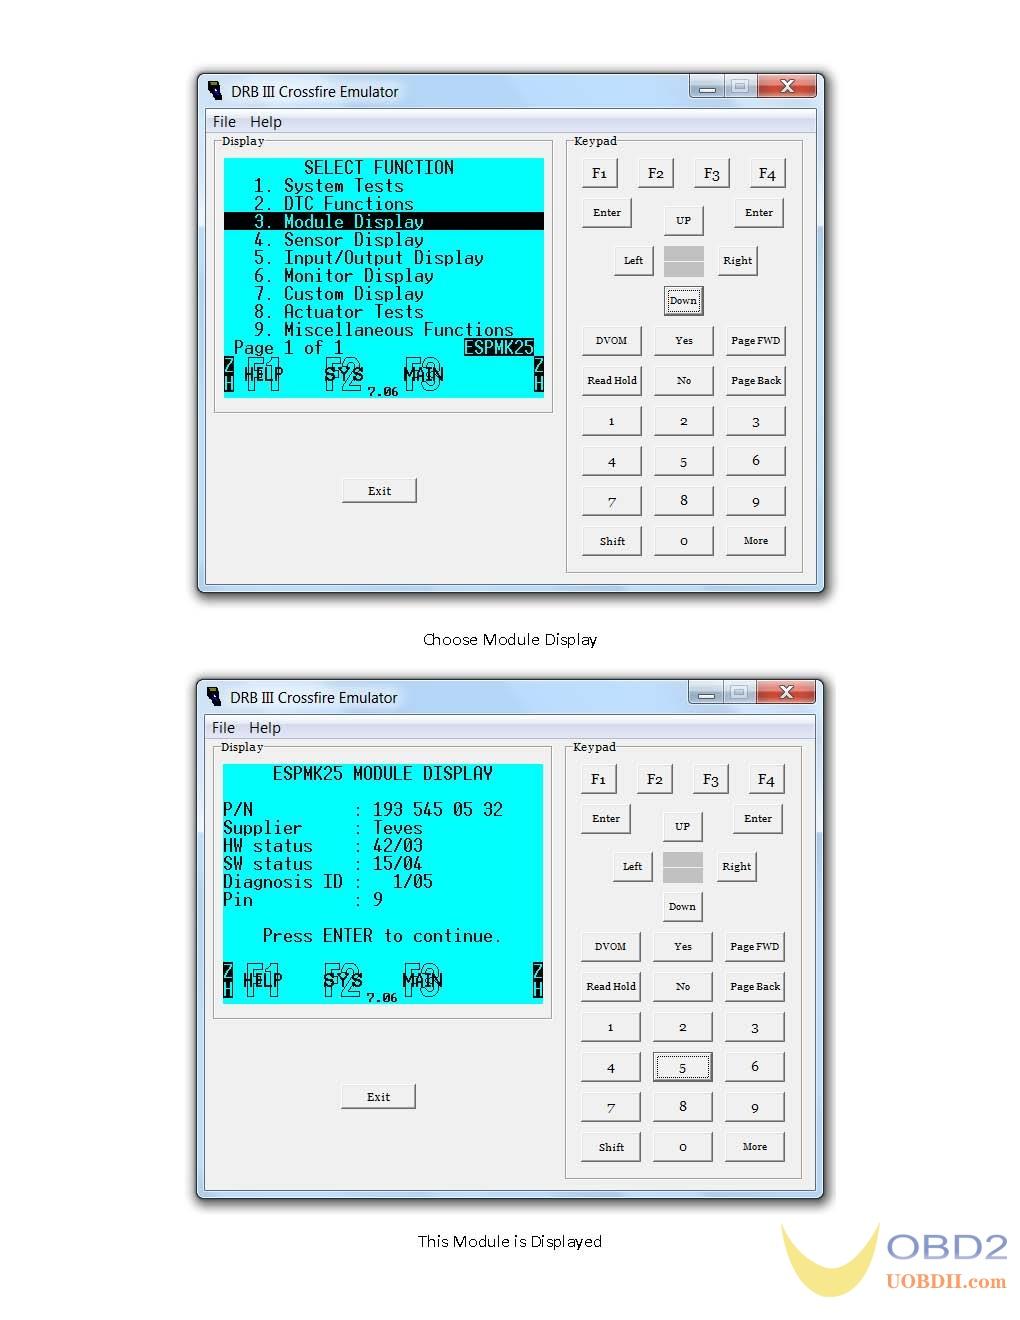 working-dbr-iii-emulator-for-chrysler-crossfire-2005-07